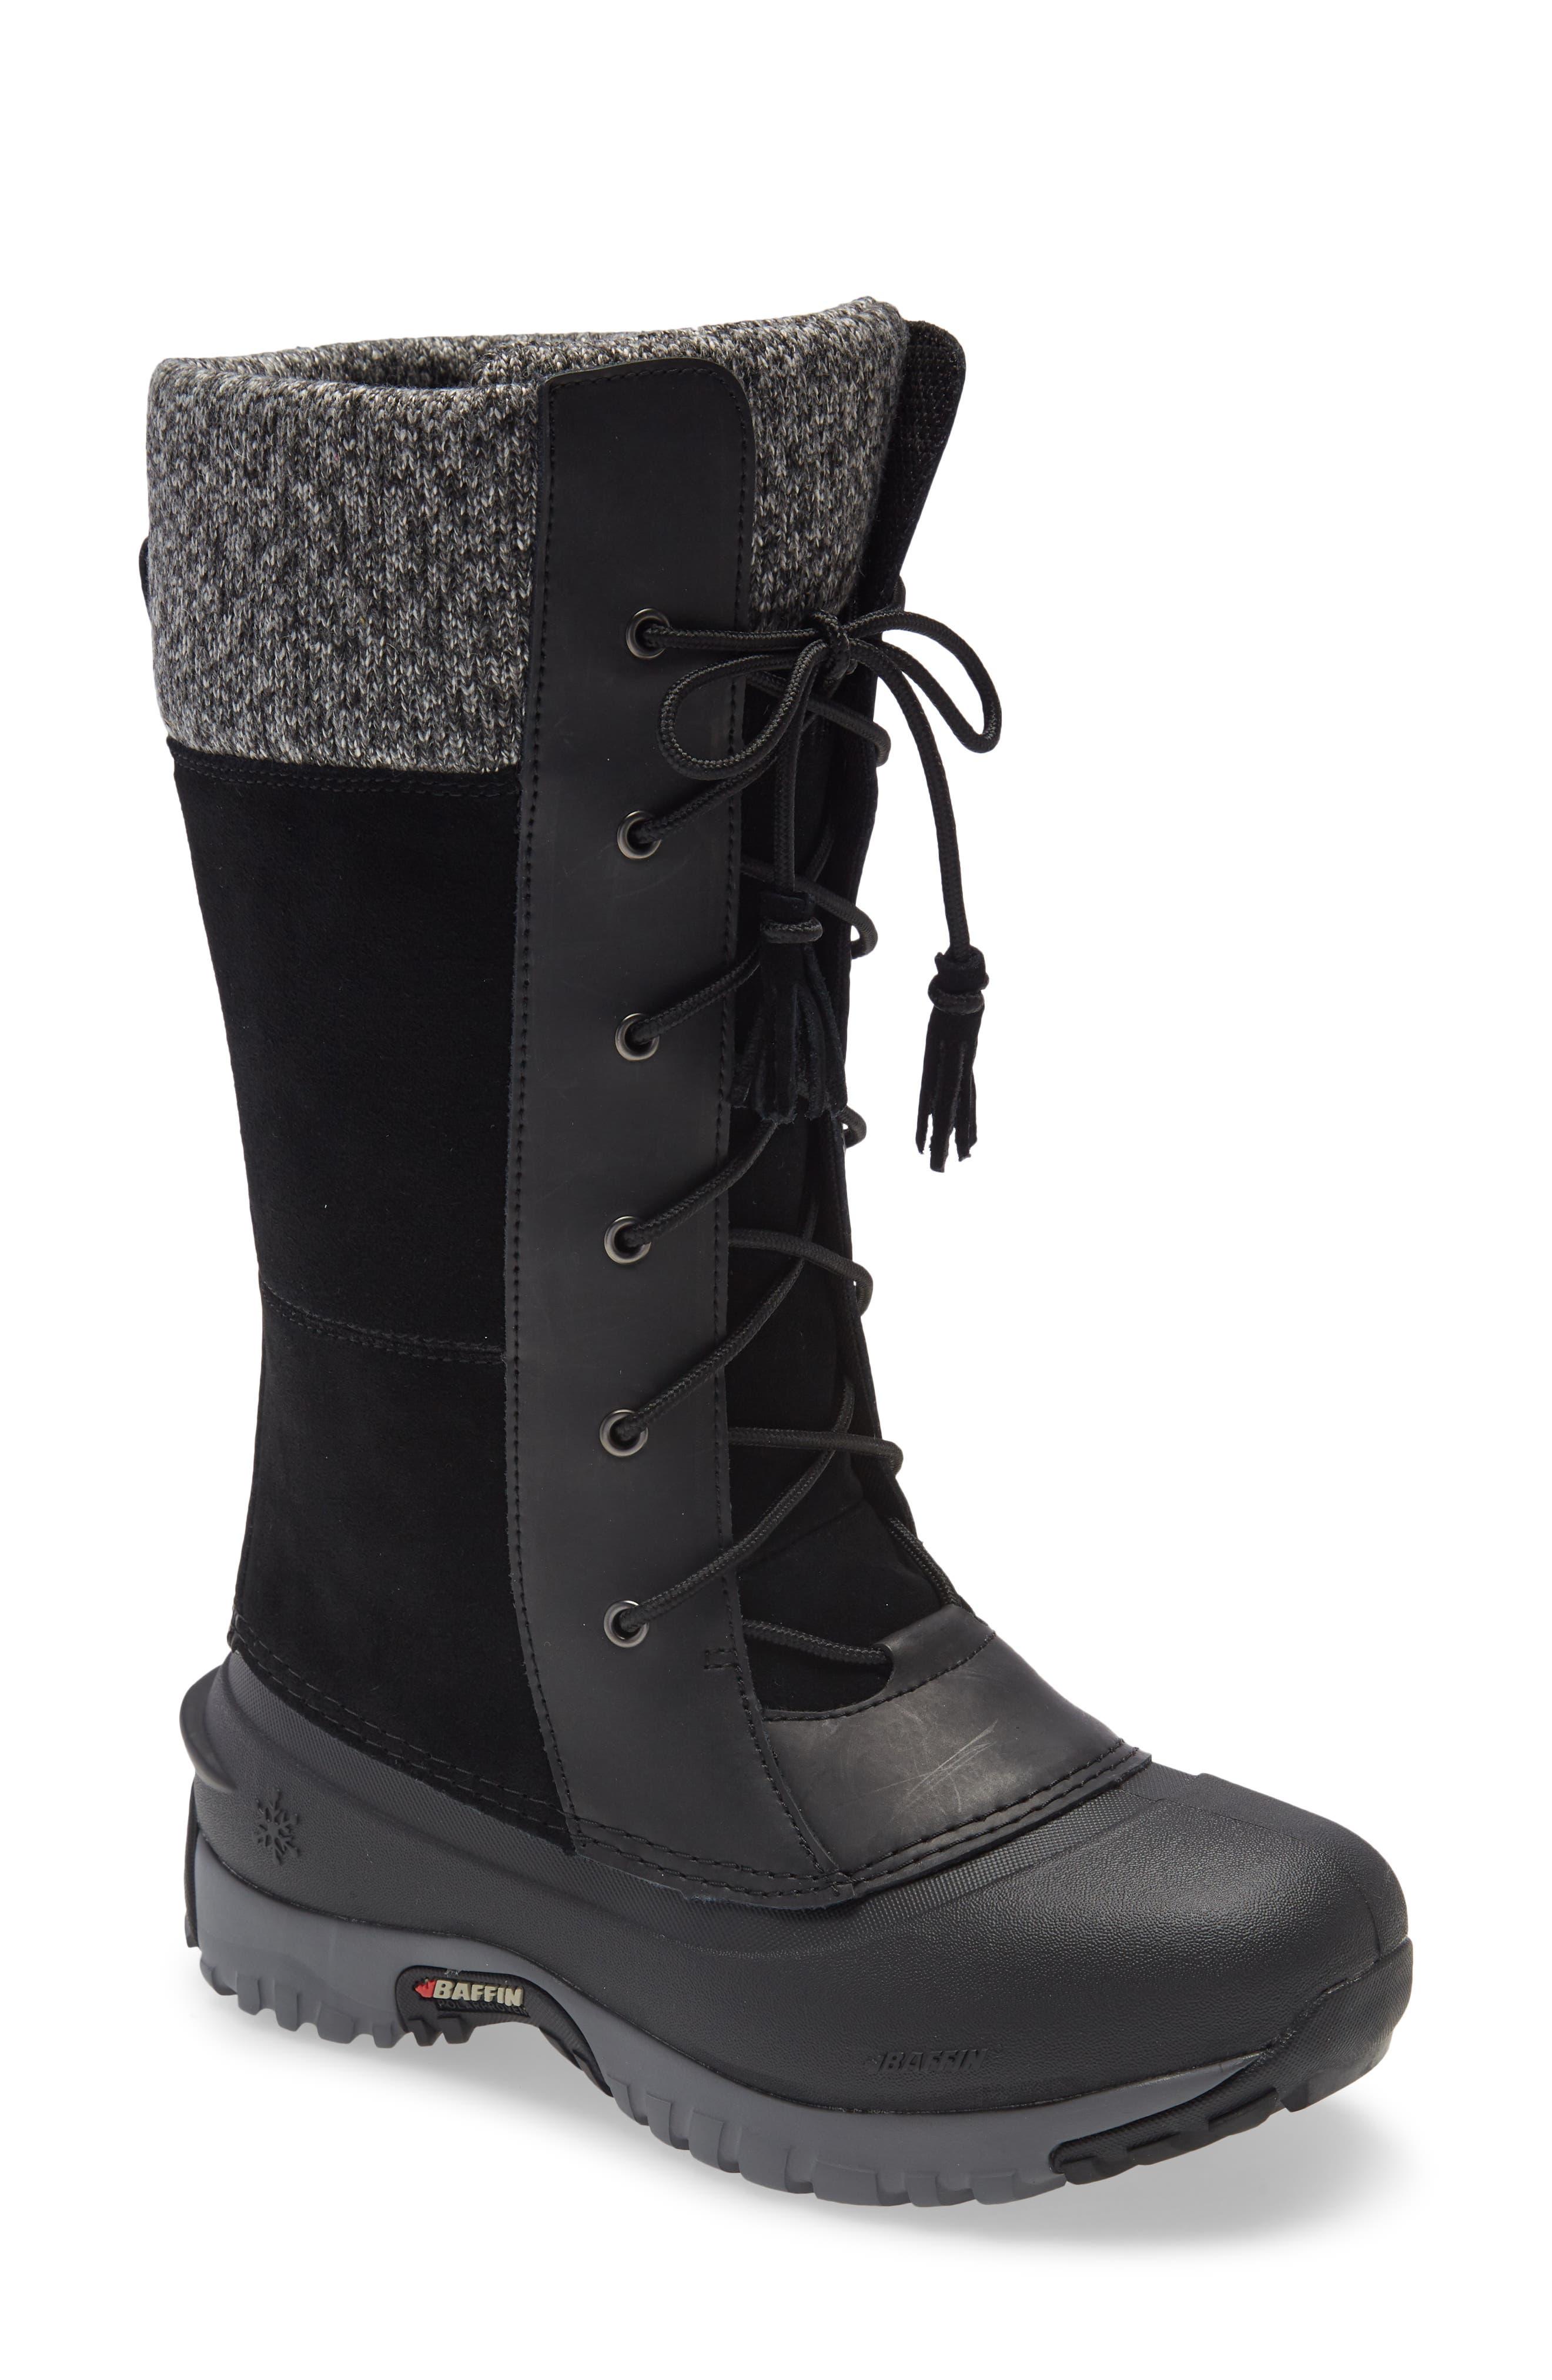 Dana Waterproof Boot